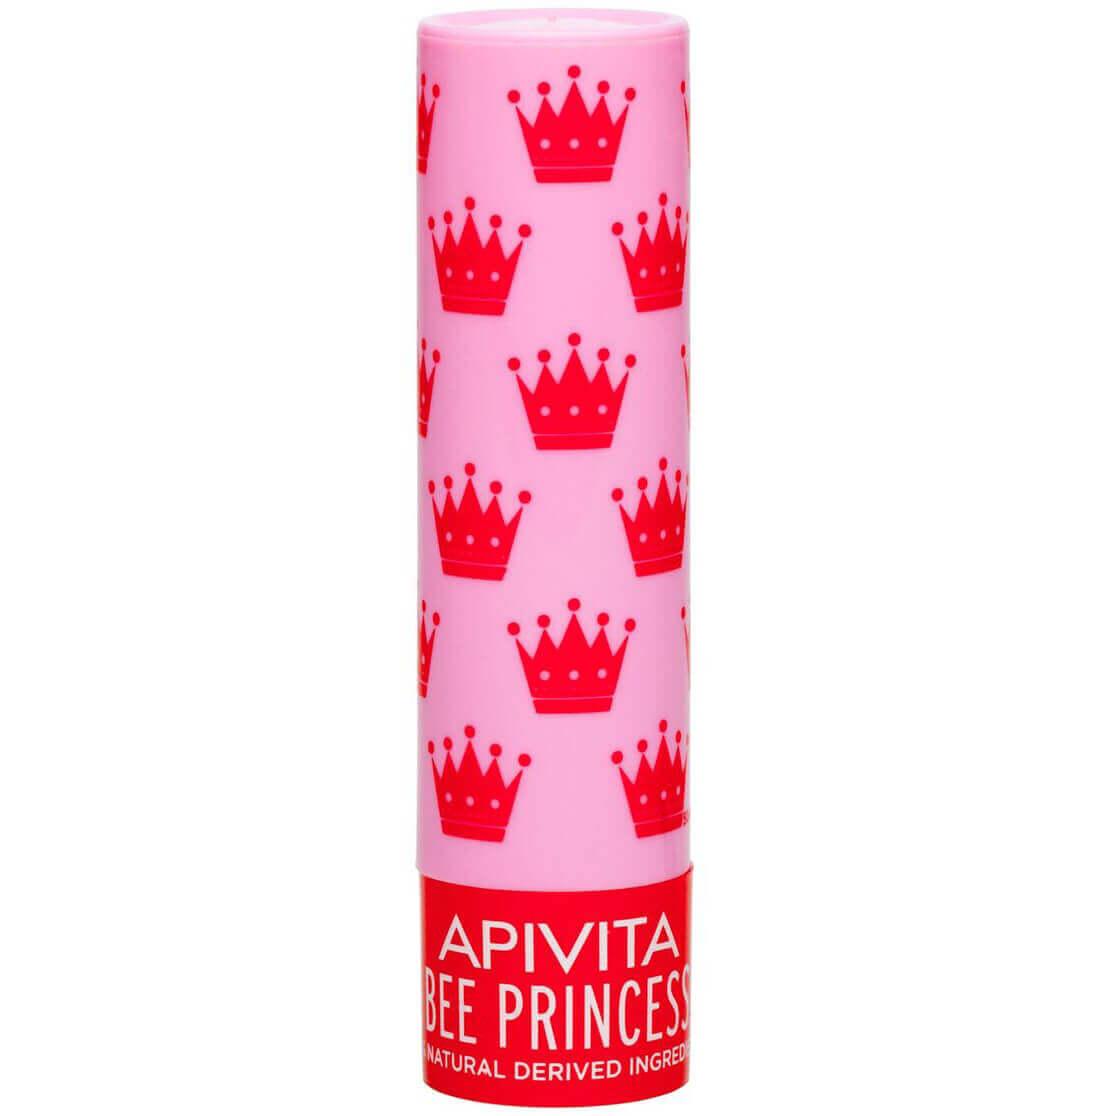 Apivita Lip Care Bee Princess Bio Eco Ενυδατικό Lip Balm Χειλιών με Βιολογικό Βερίκοκο & Βιταμίνες 4.4g